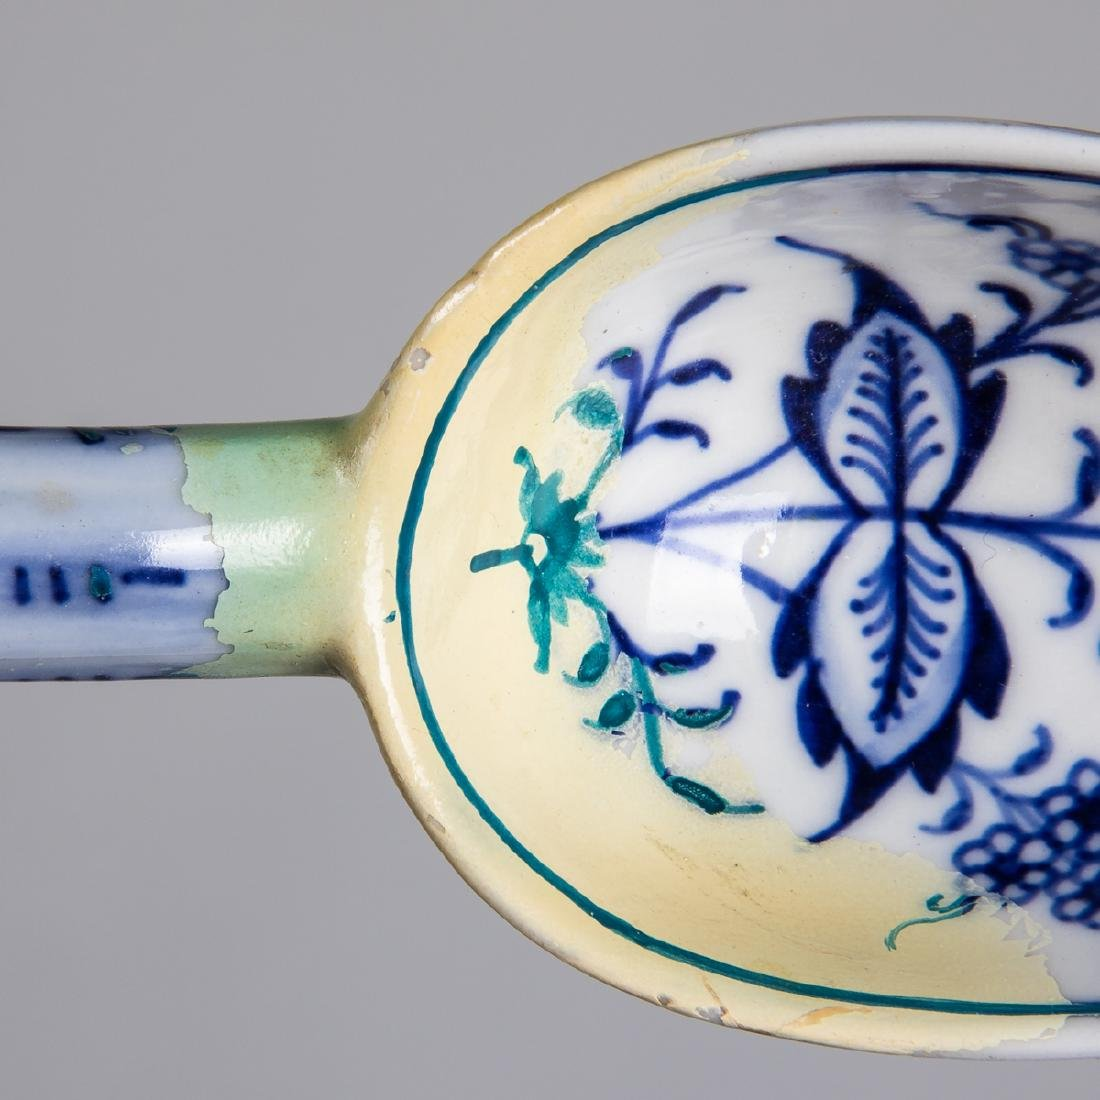 A Meissen Porcelain Dinner Service in the Blue Onion - 4